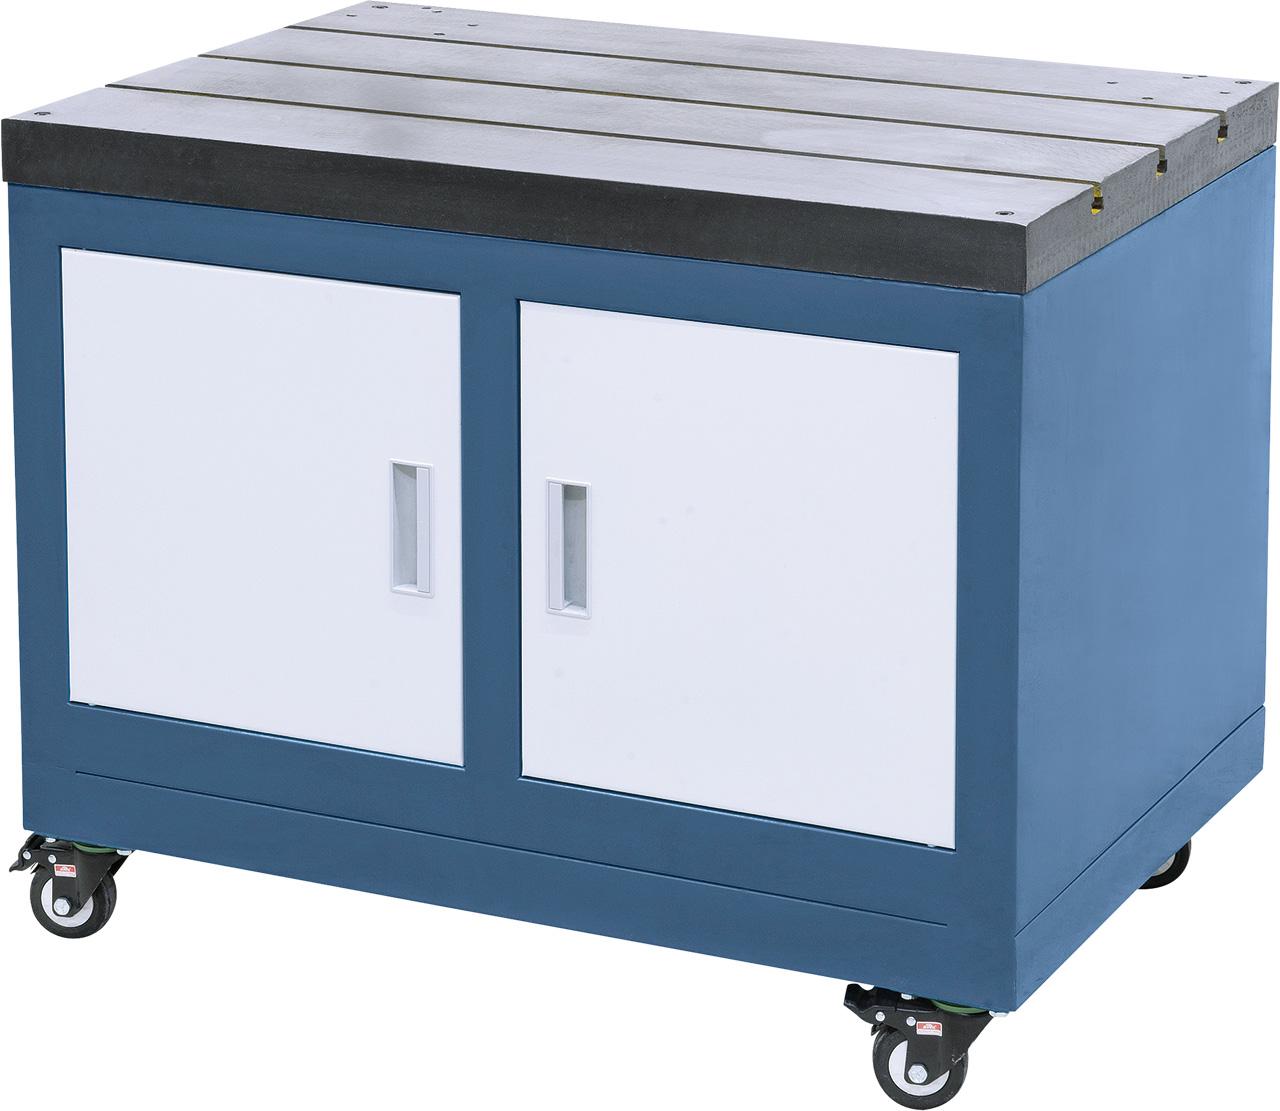 Untergestell 900 x 600 mm f. TM-Serie BERNARDO